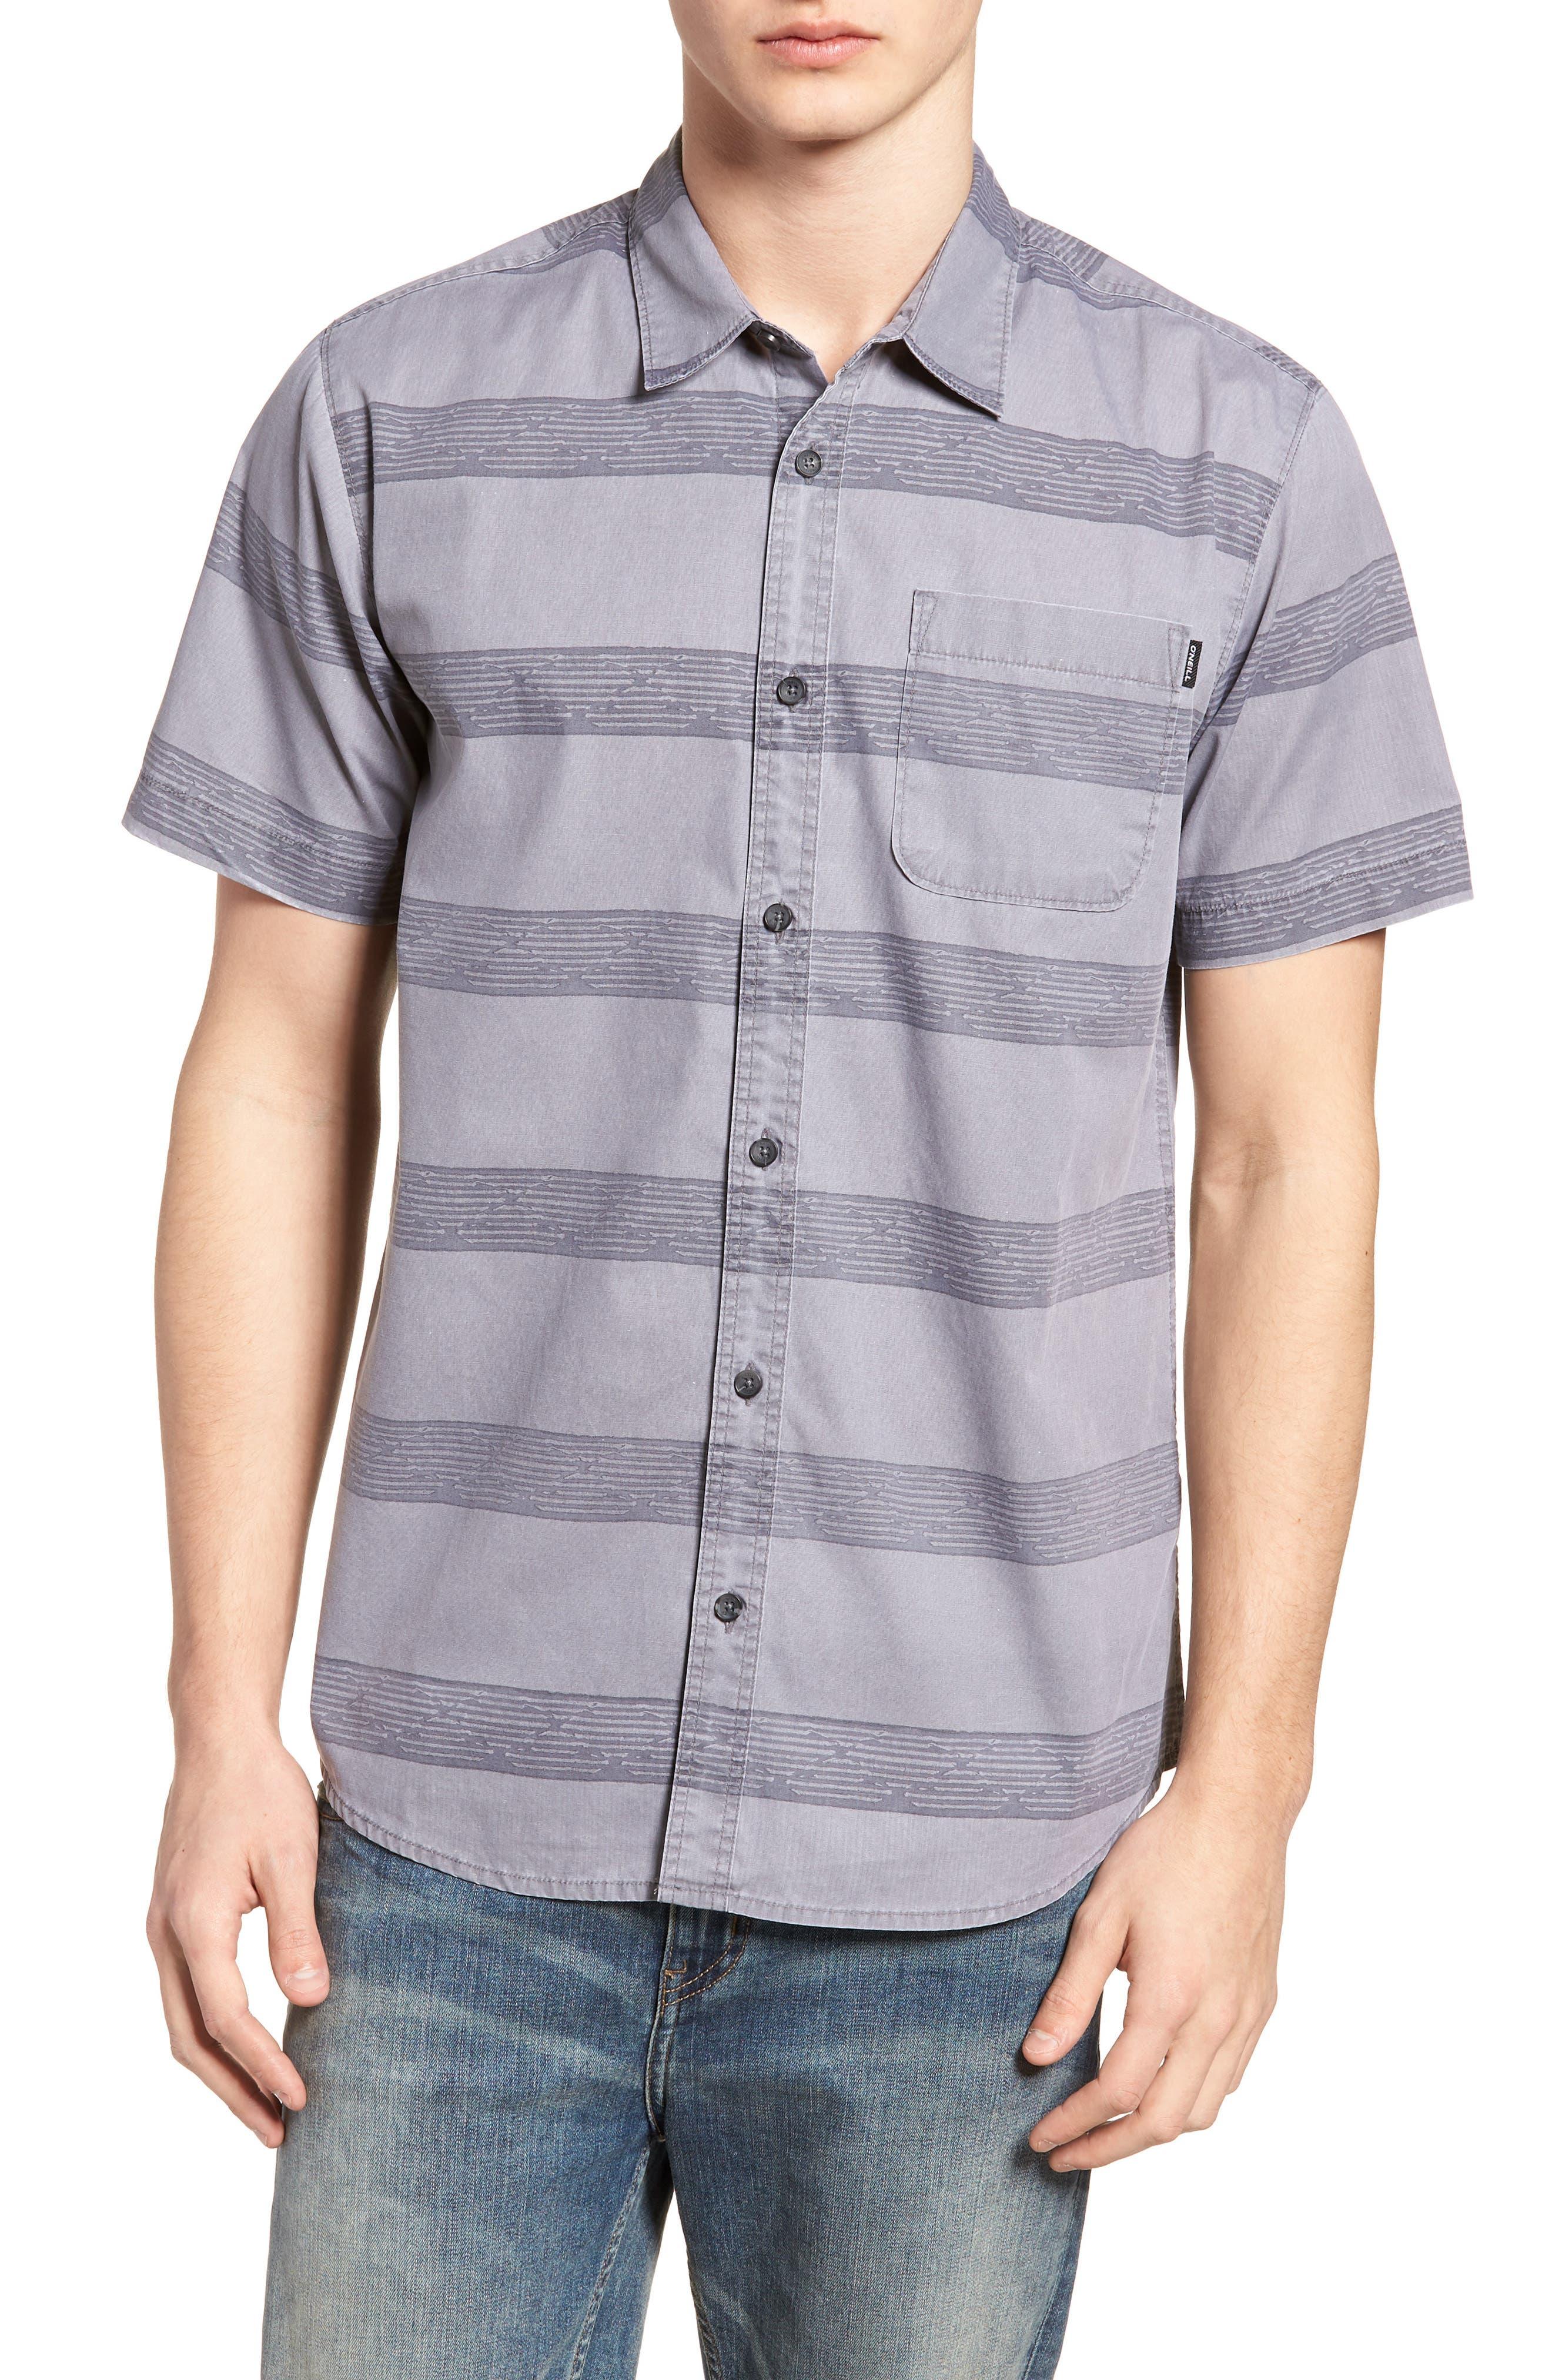 Wagner Woven Shirt,                         Main,                         color, Fog